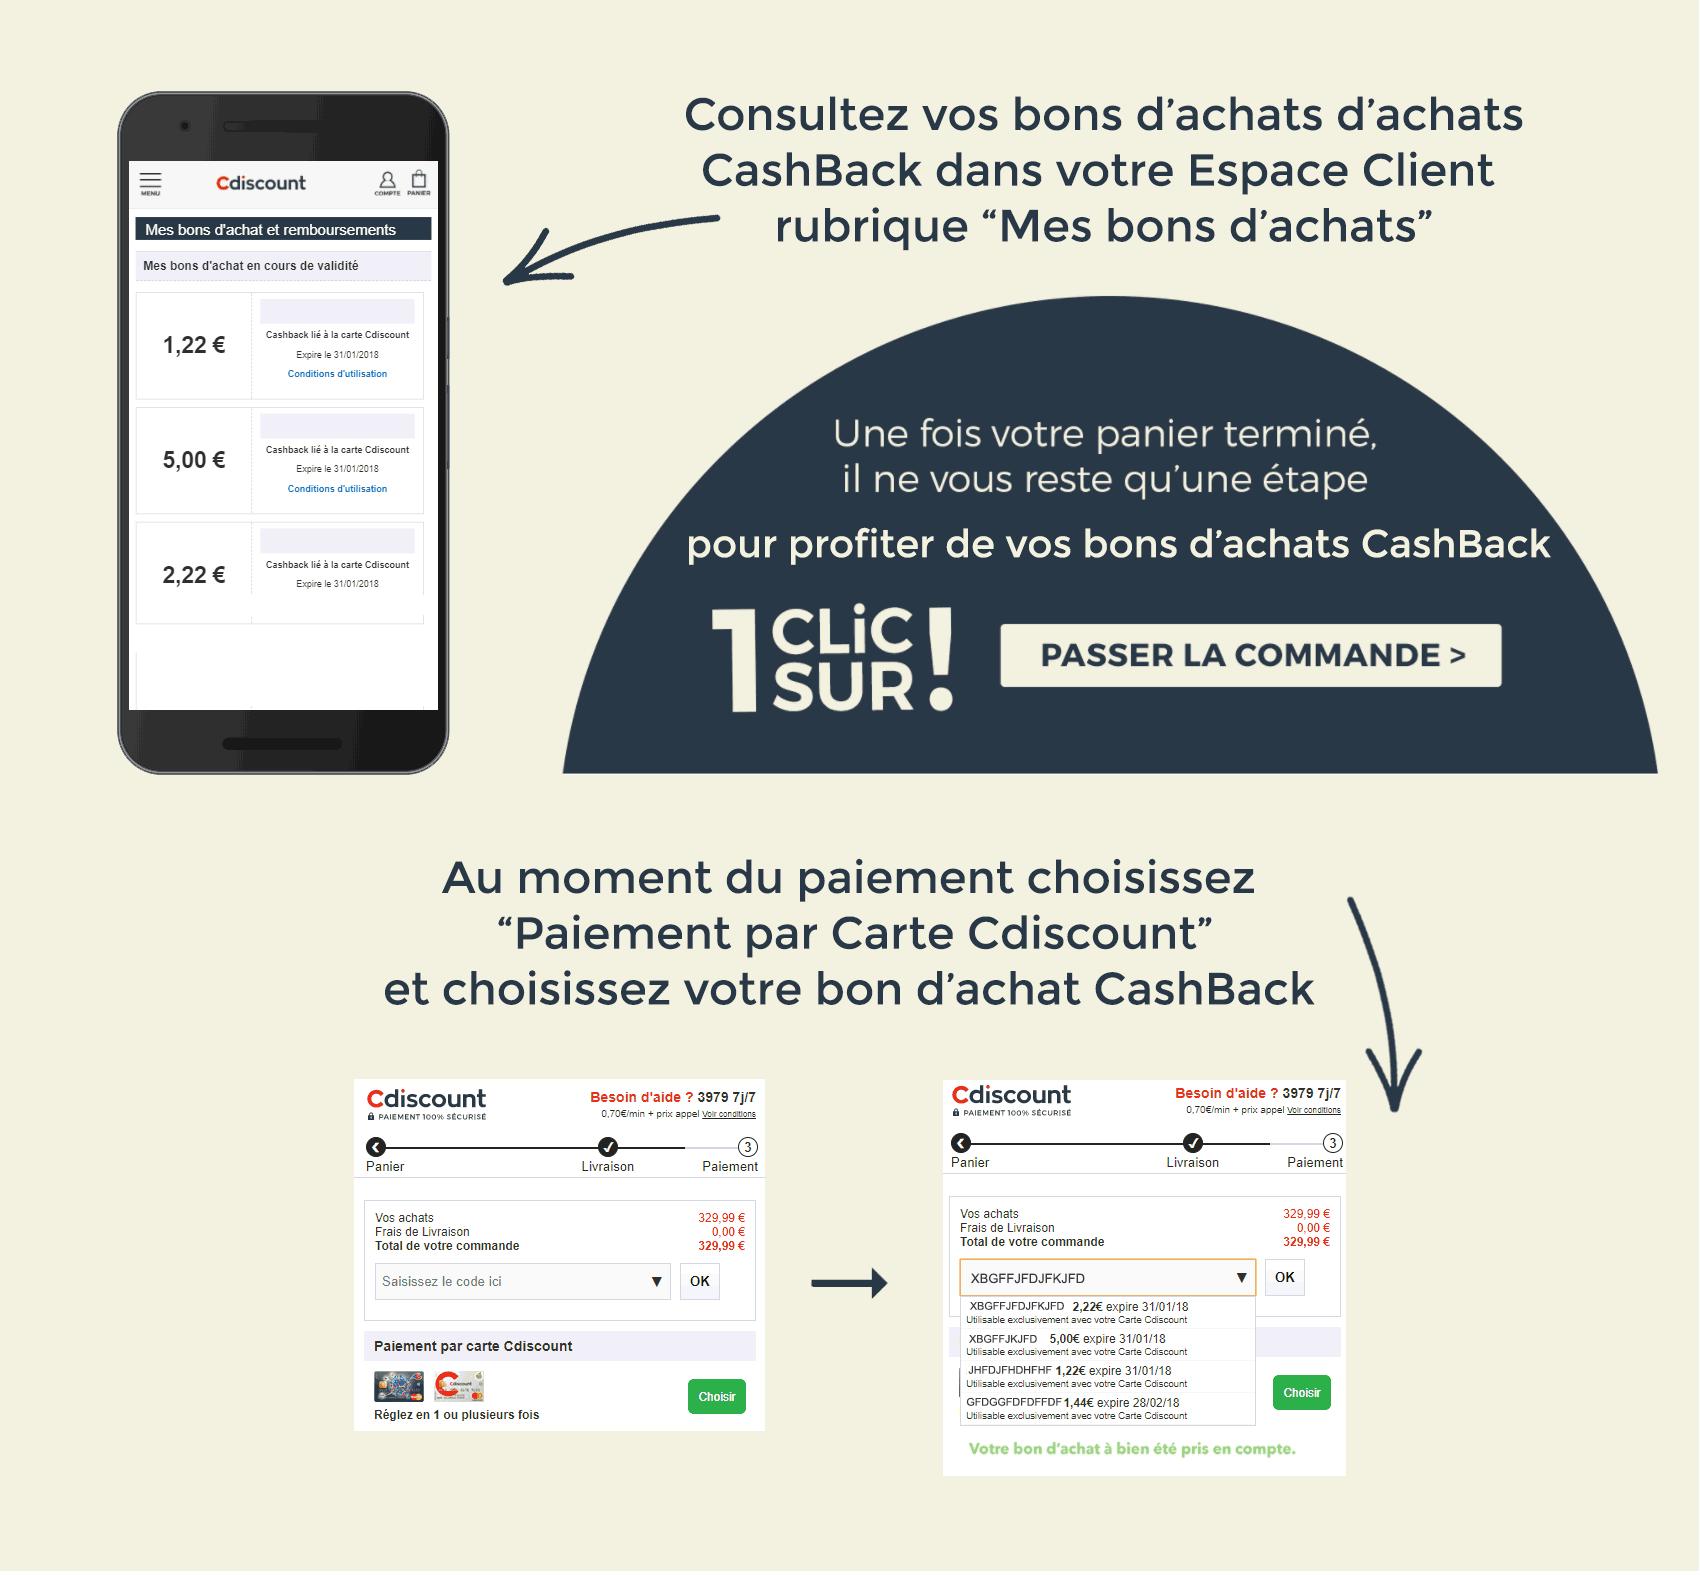 Carte Cdiscount Ou Lutiliser.Cashback Carte Cdiscount Cumulez Des Euros